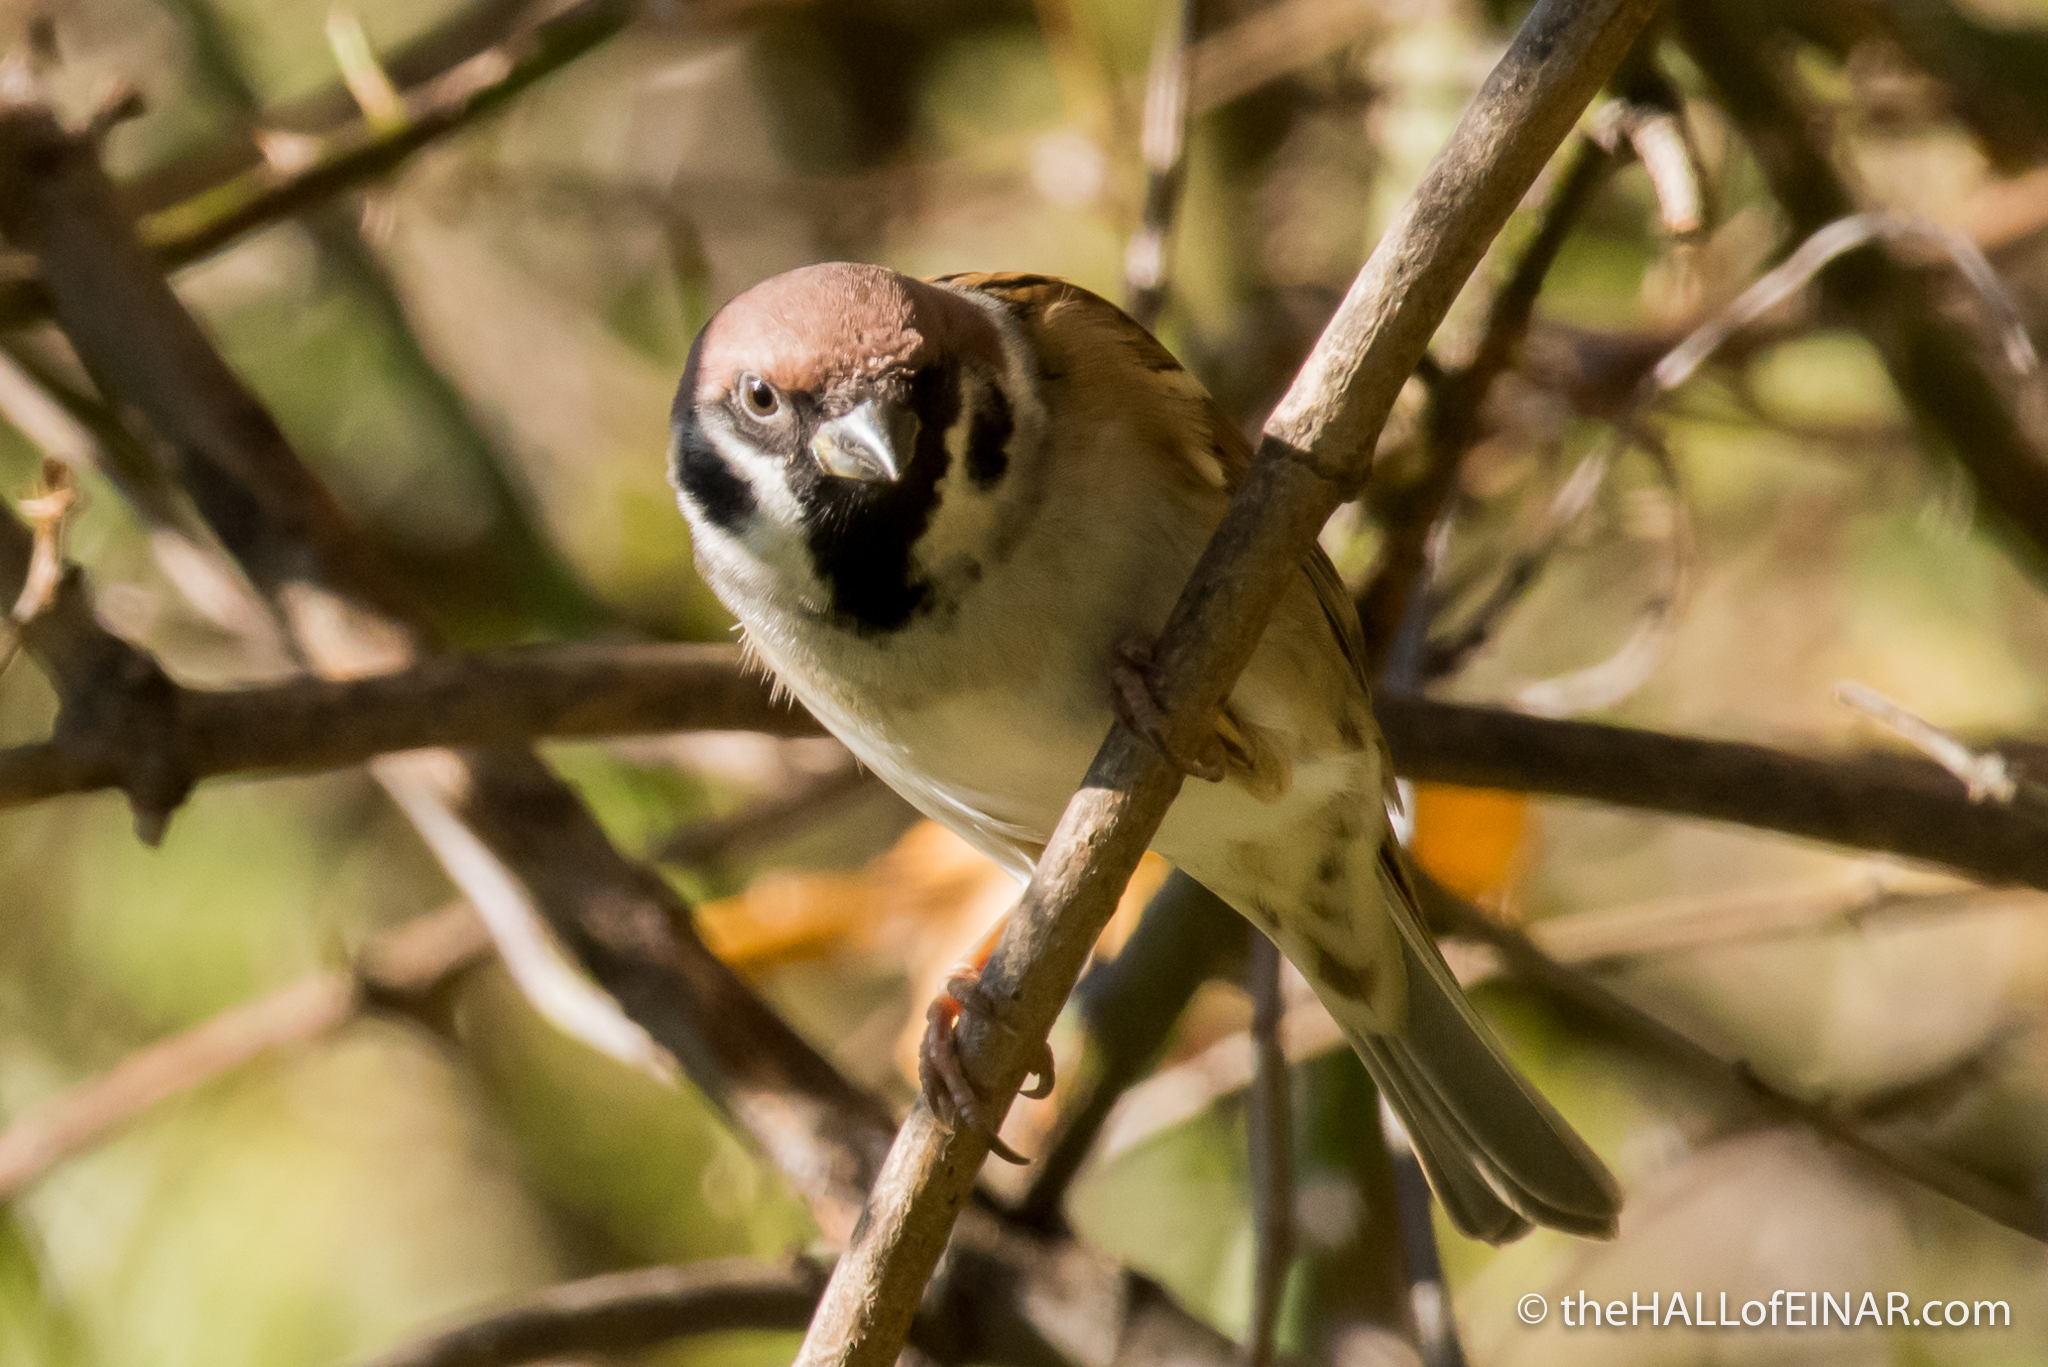 Tree Sparrow - The Hall of Einar - photograph (c) David Bailey (not the)